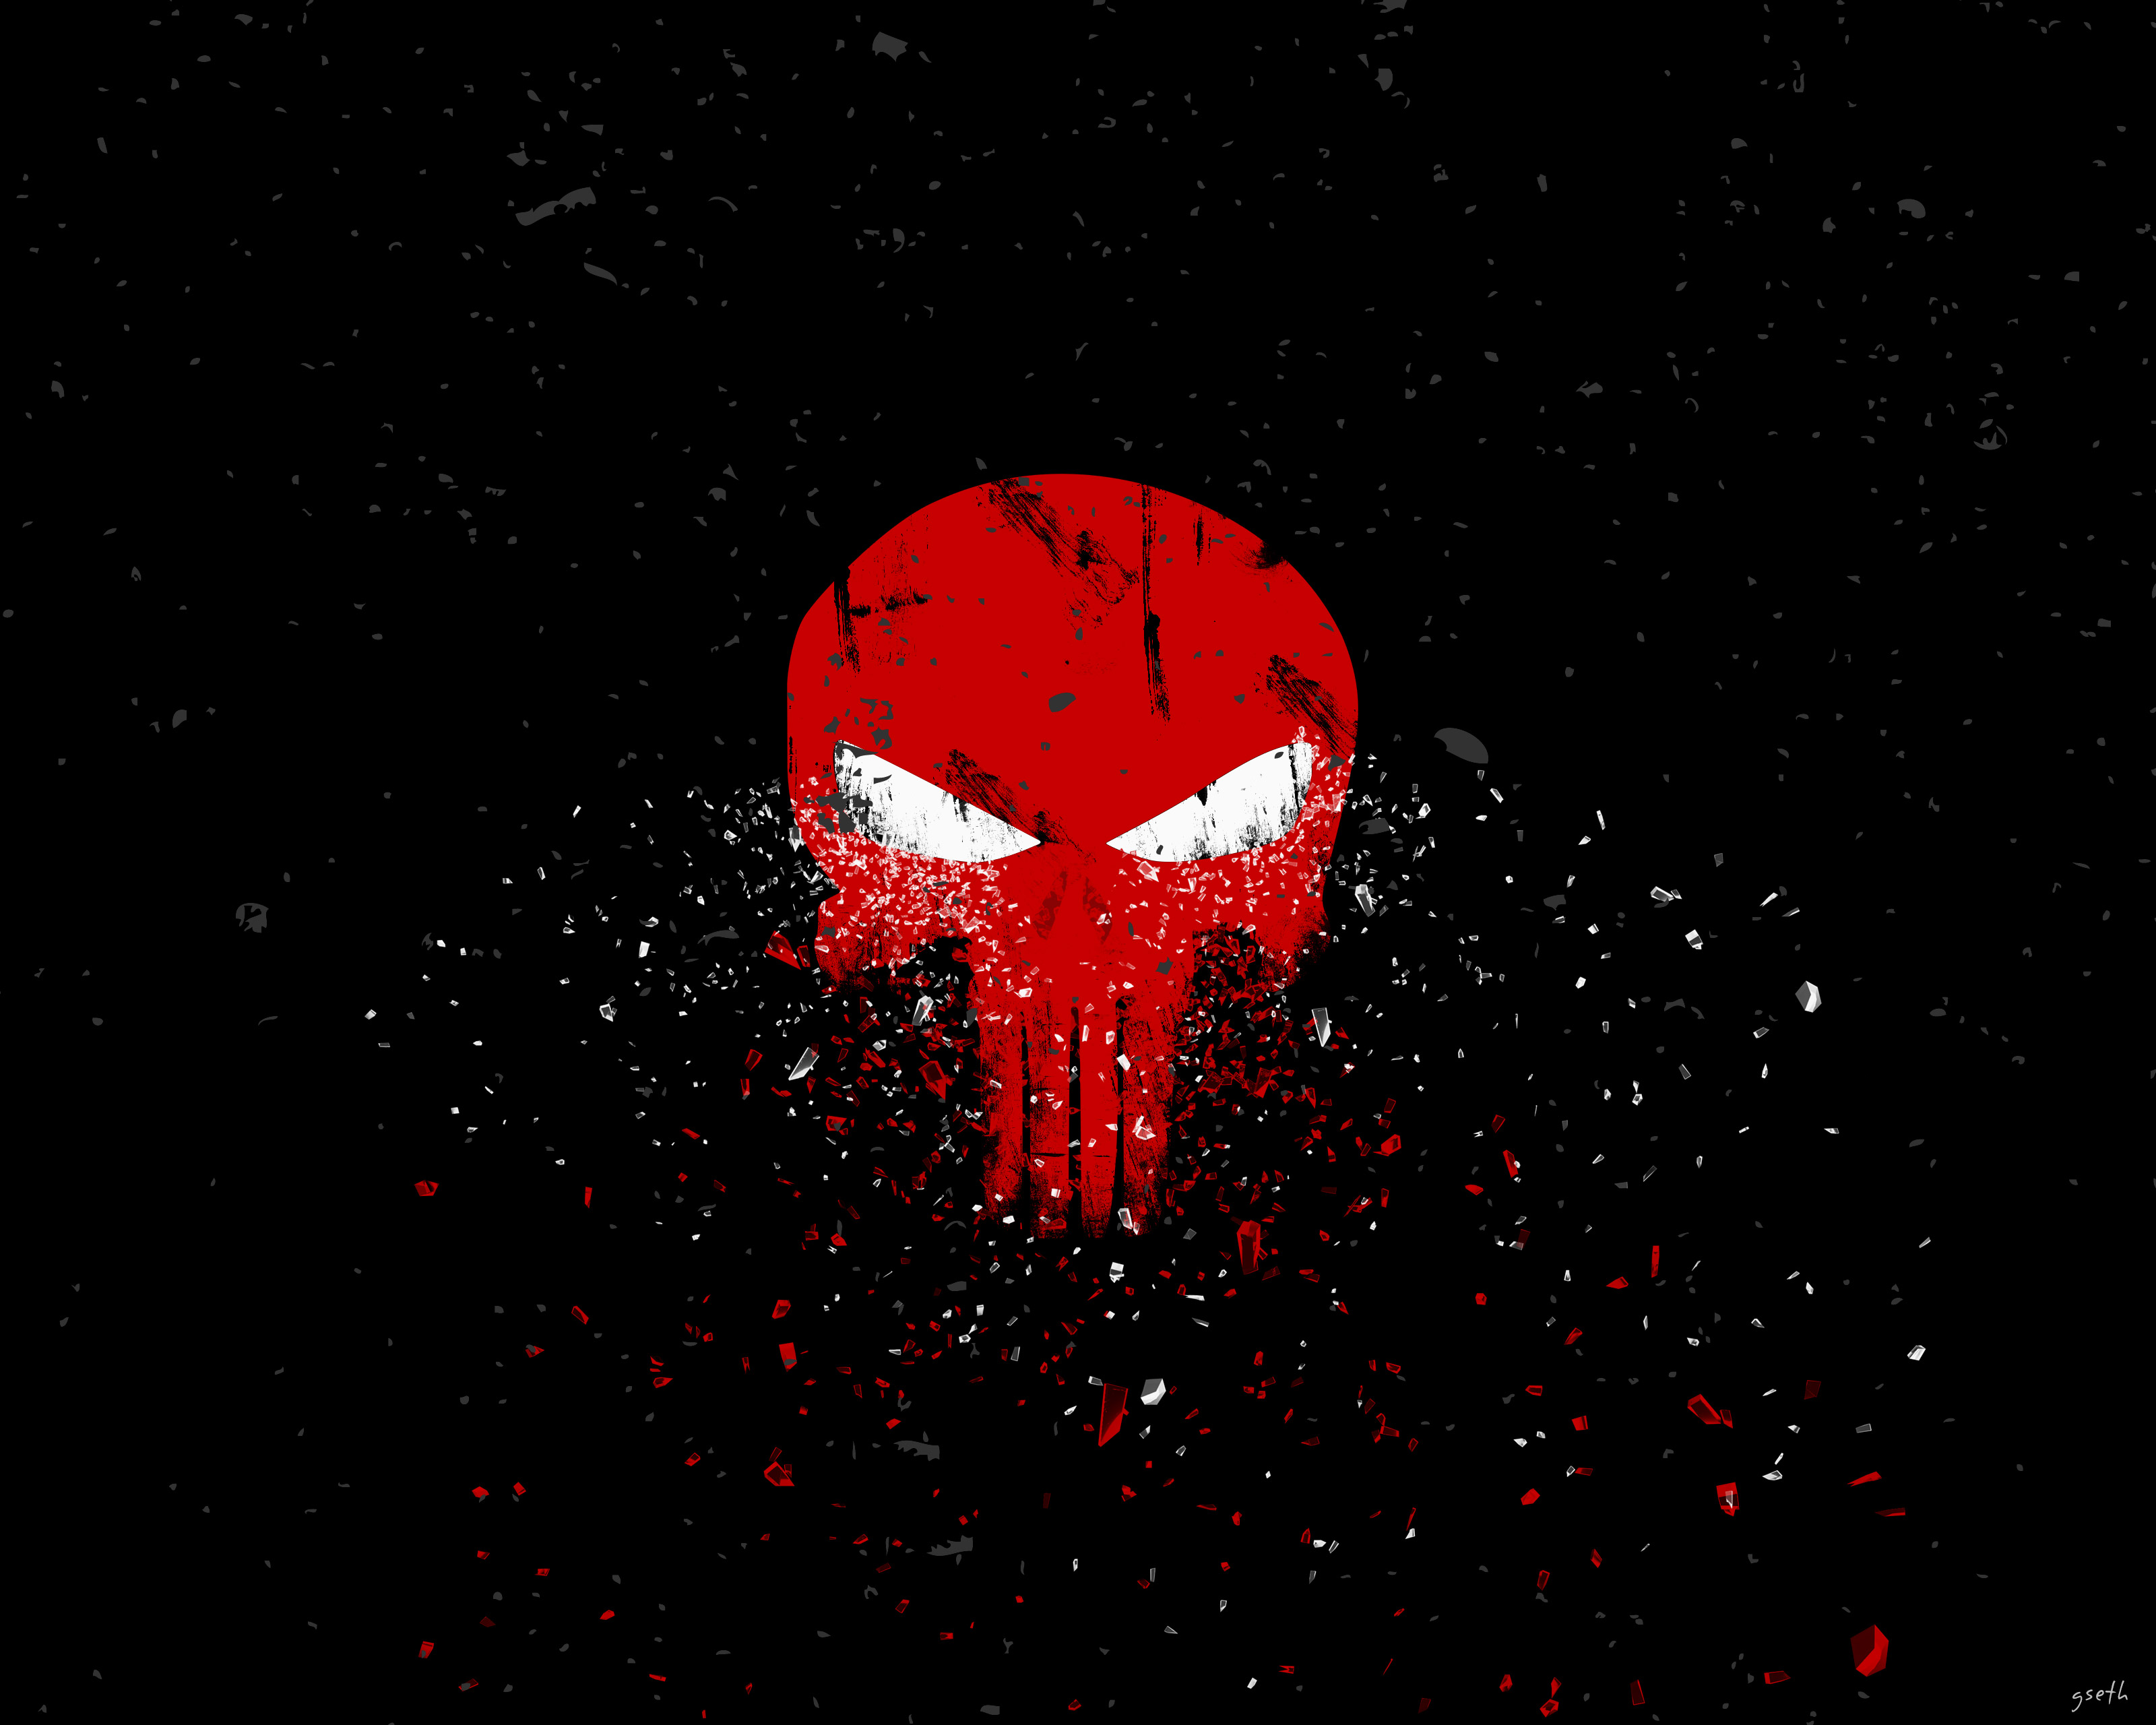 Punisher logo 4k hd artist 4k wallpapers images - Skull 4k images ...